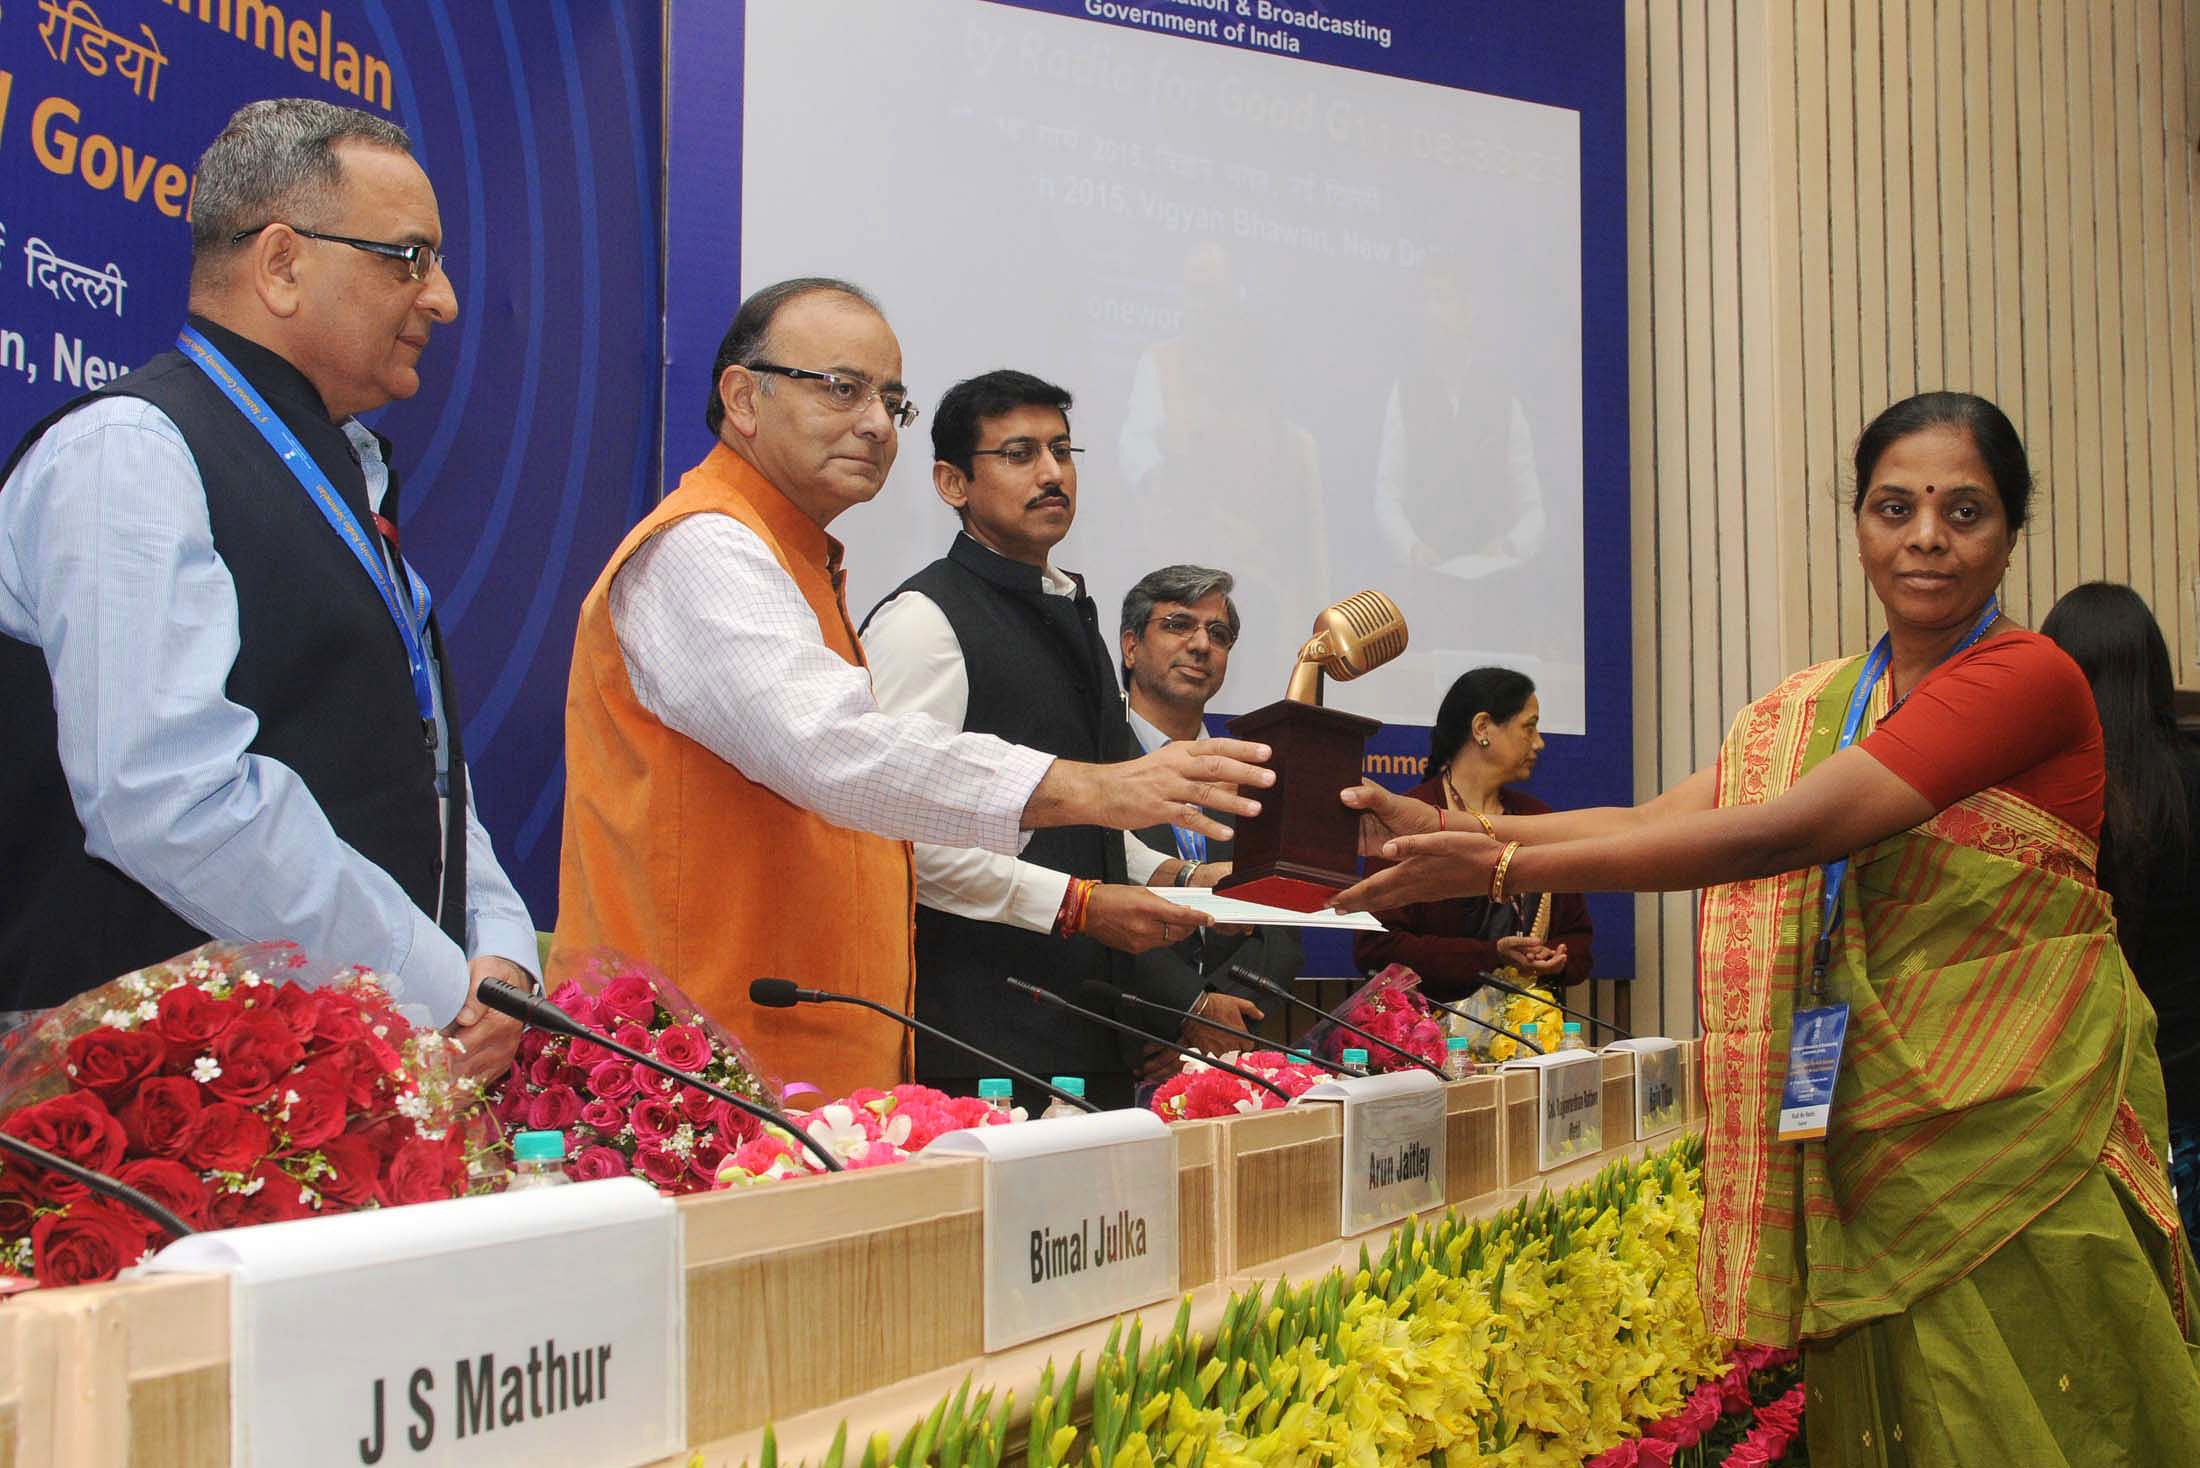 Shanta Koshti of Rudi No Radio receiving an award for promoting culture at the Community Radio Sammelan held recently in New Delhi.